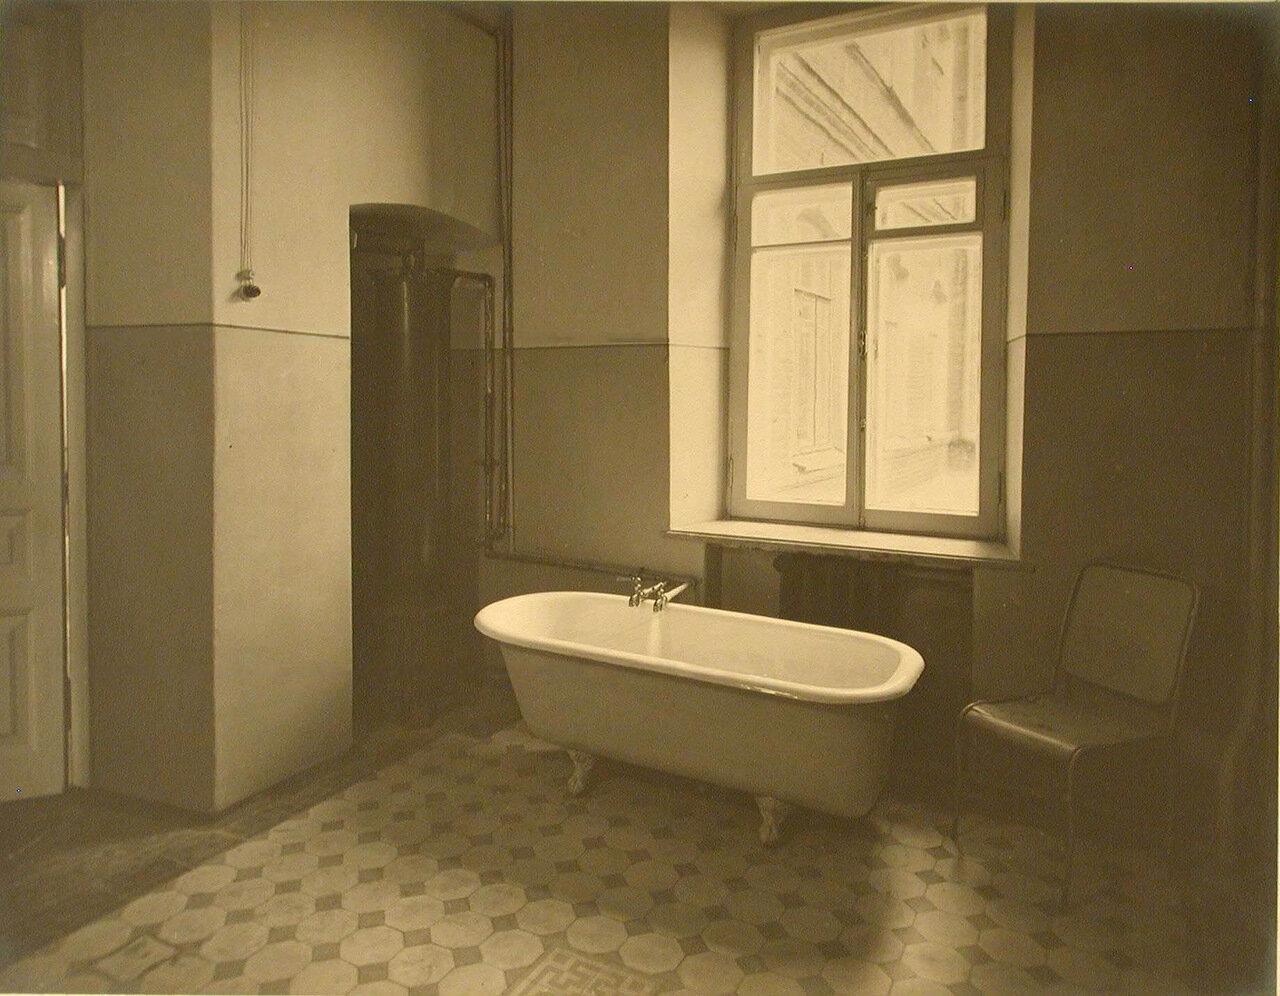 09. Вид ванной комнаты лазарета